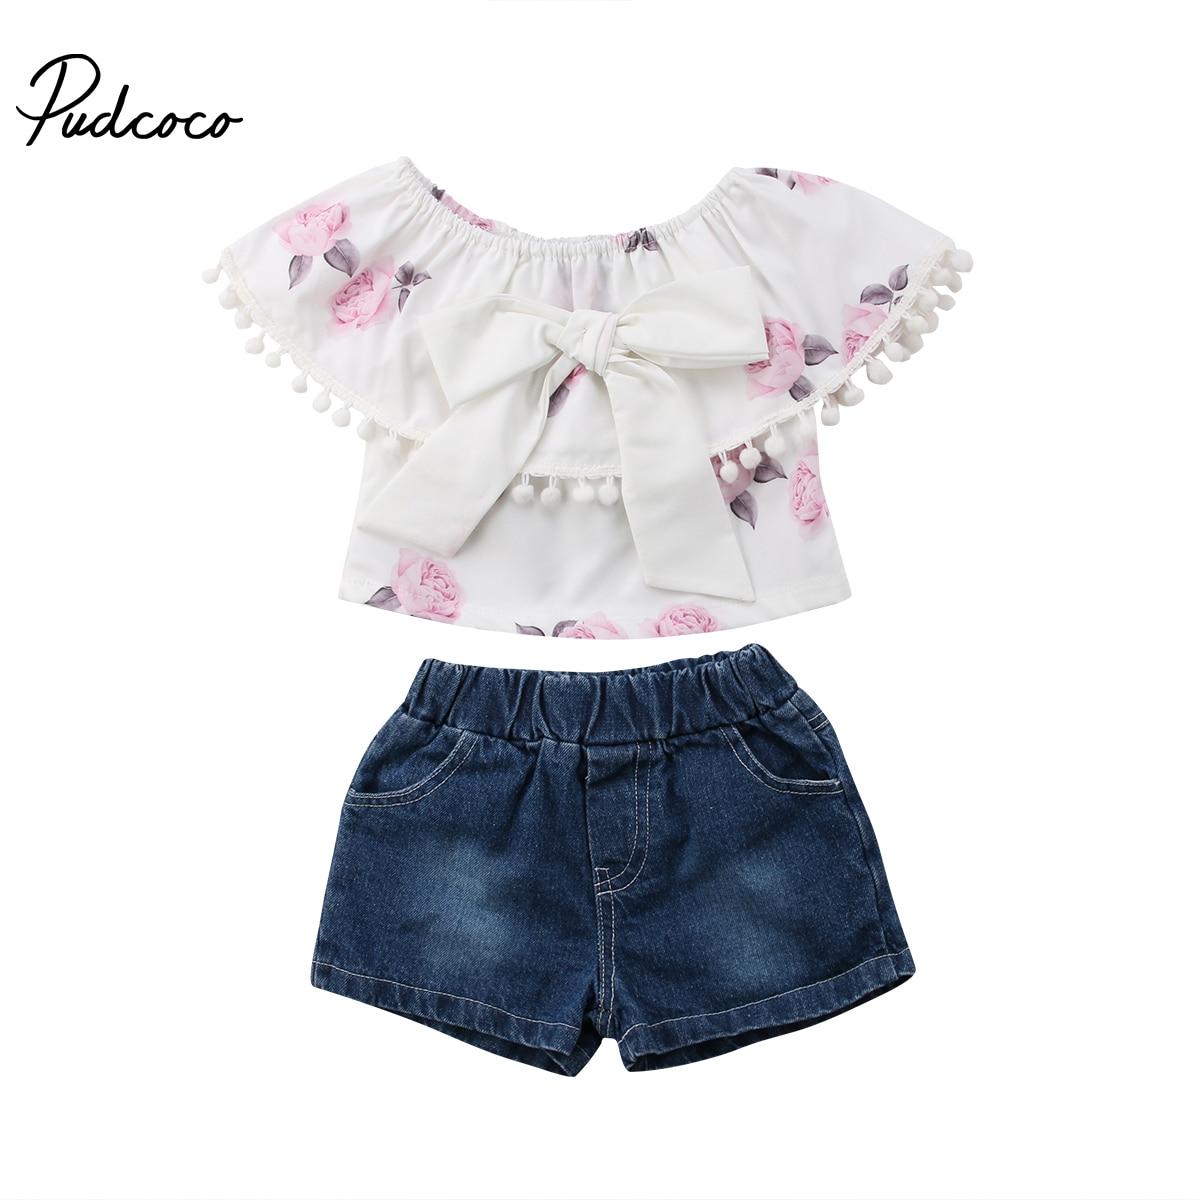 Neugeborenen Baby Mädchen Kleidung Kurzarm Oansatz Quaste Tops + hosen Leggings Outfits Set 1-6 Jahre